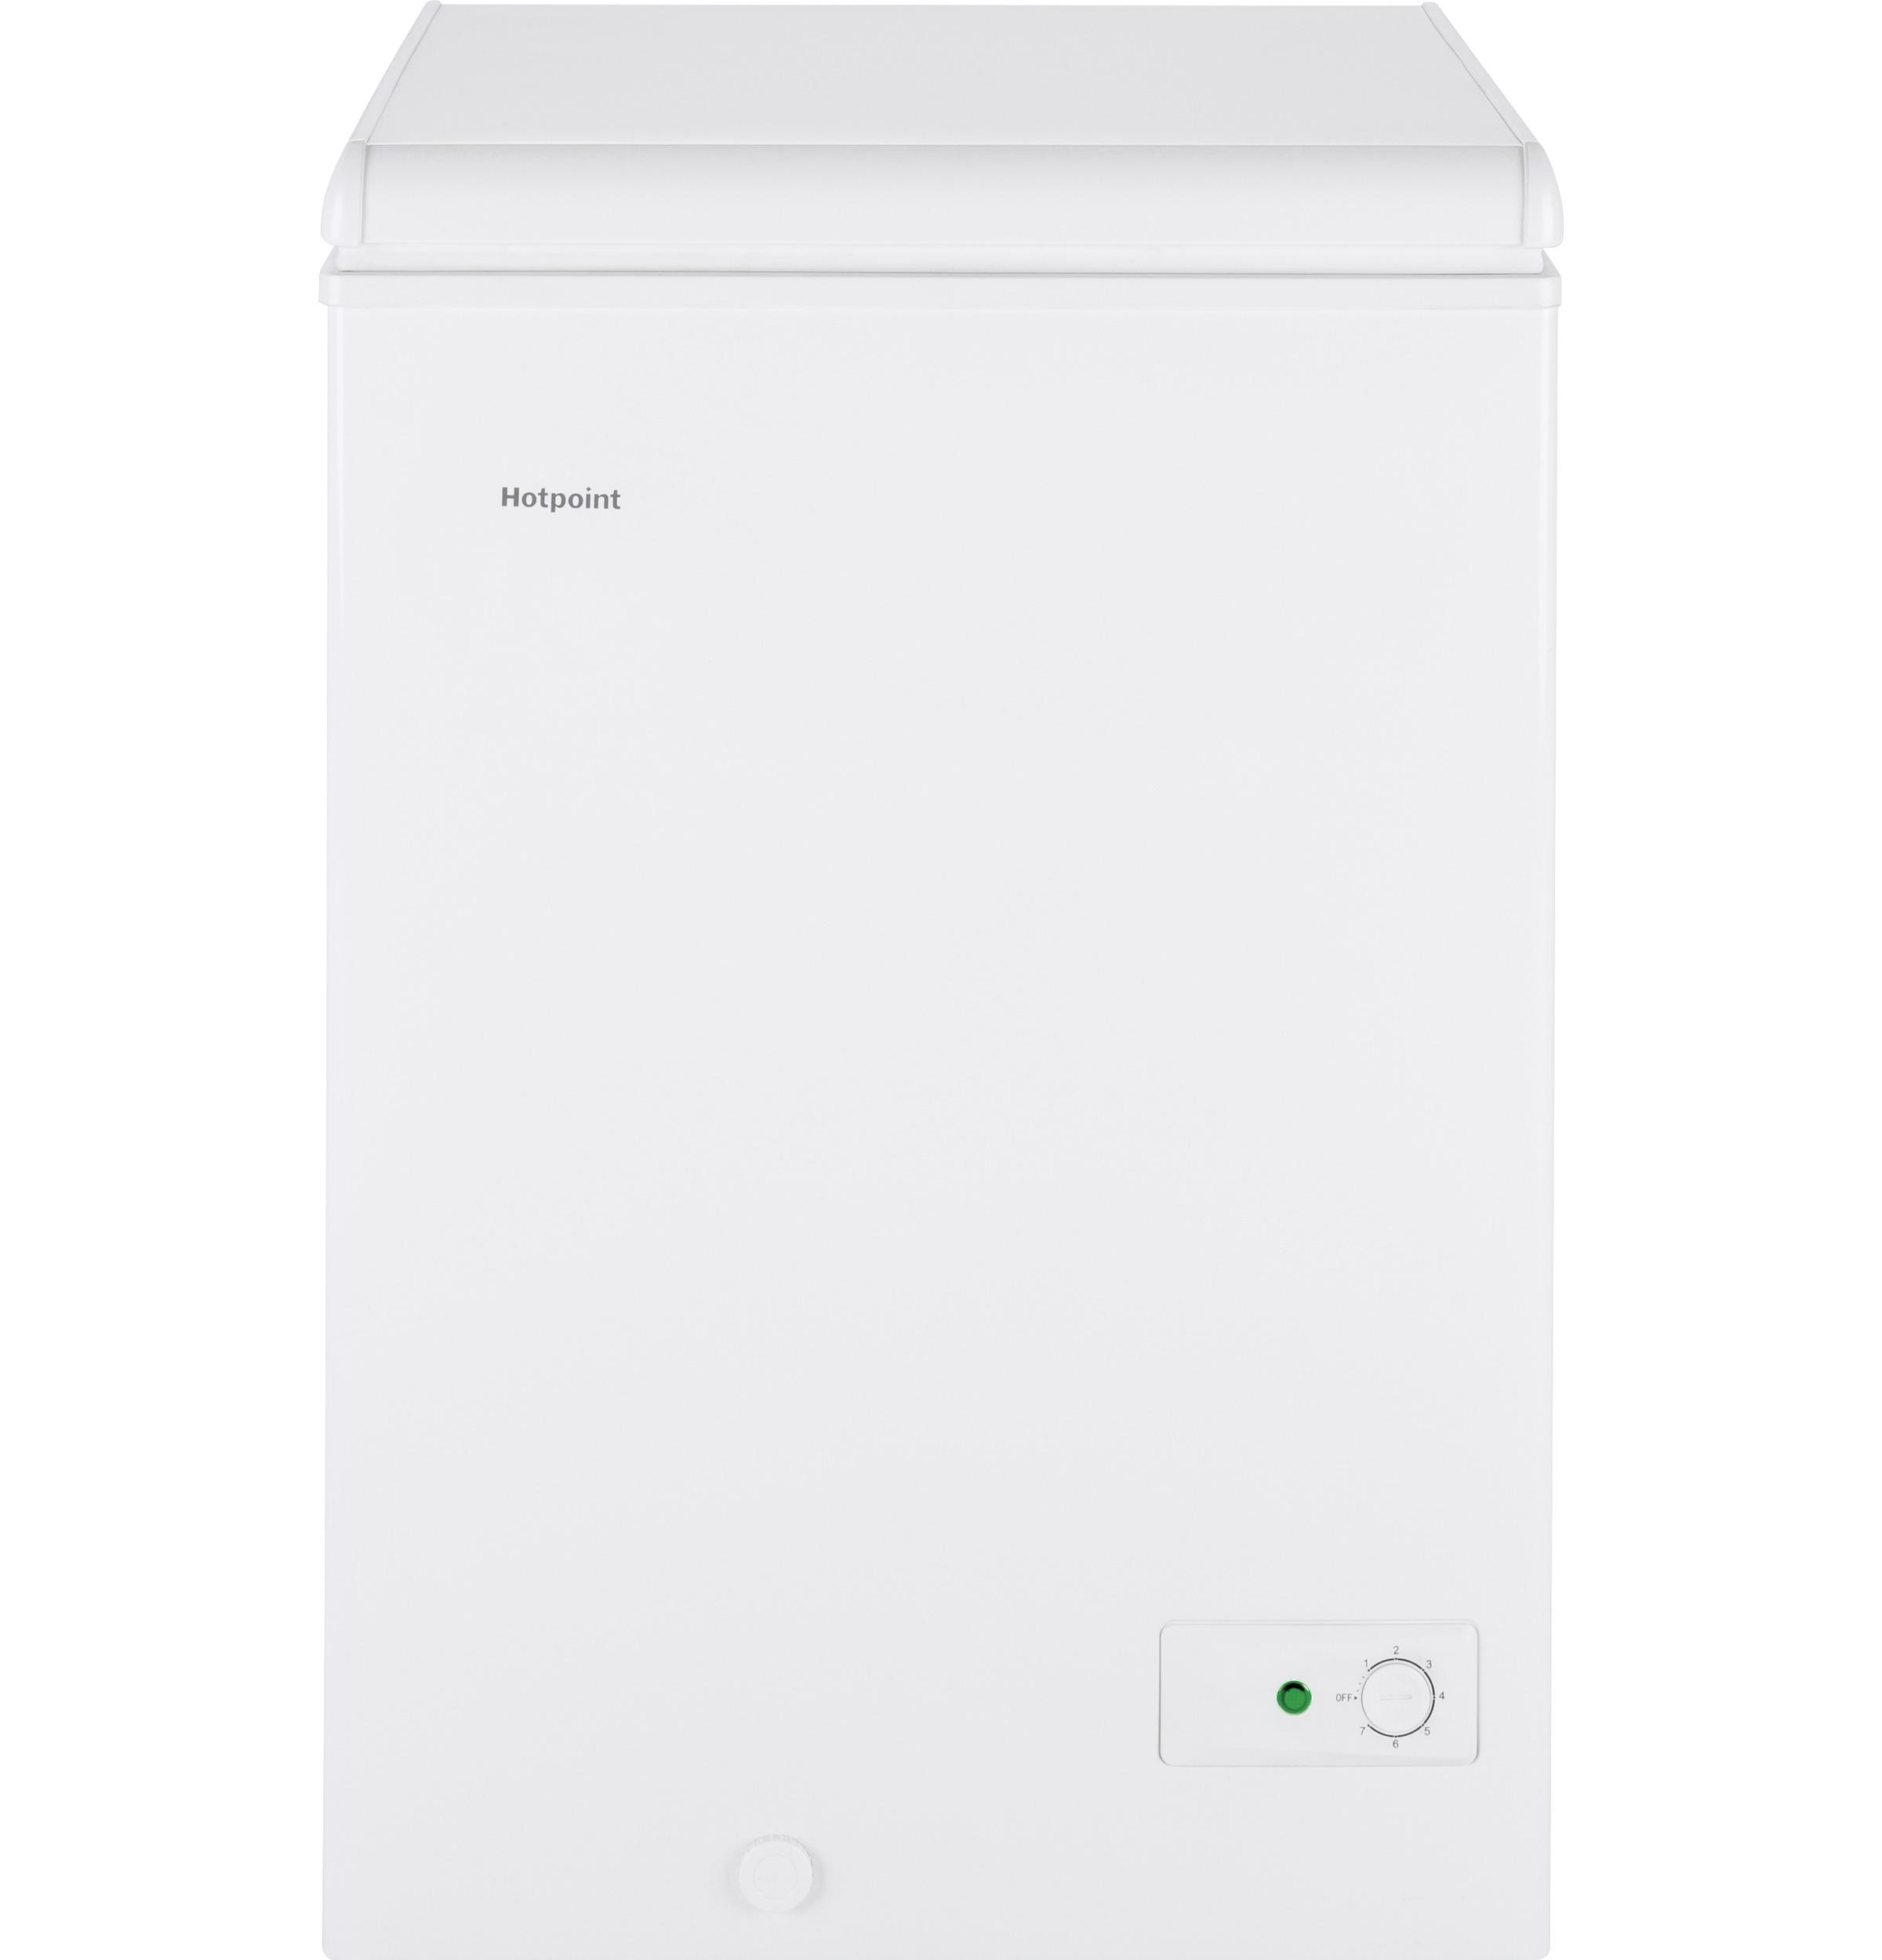 sears kenmore elite upright freezer manual photos and [ 2400 x 2500 Pixel ]